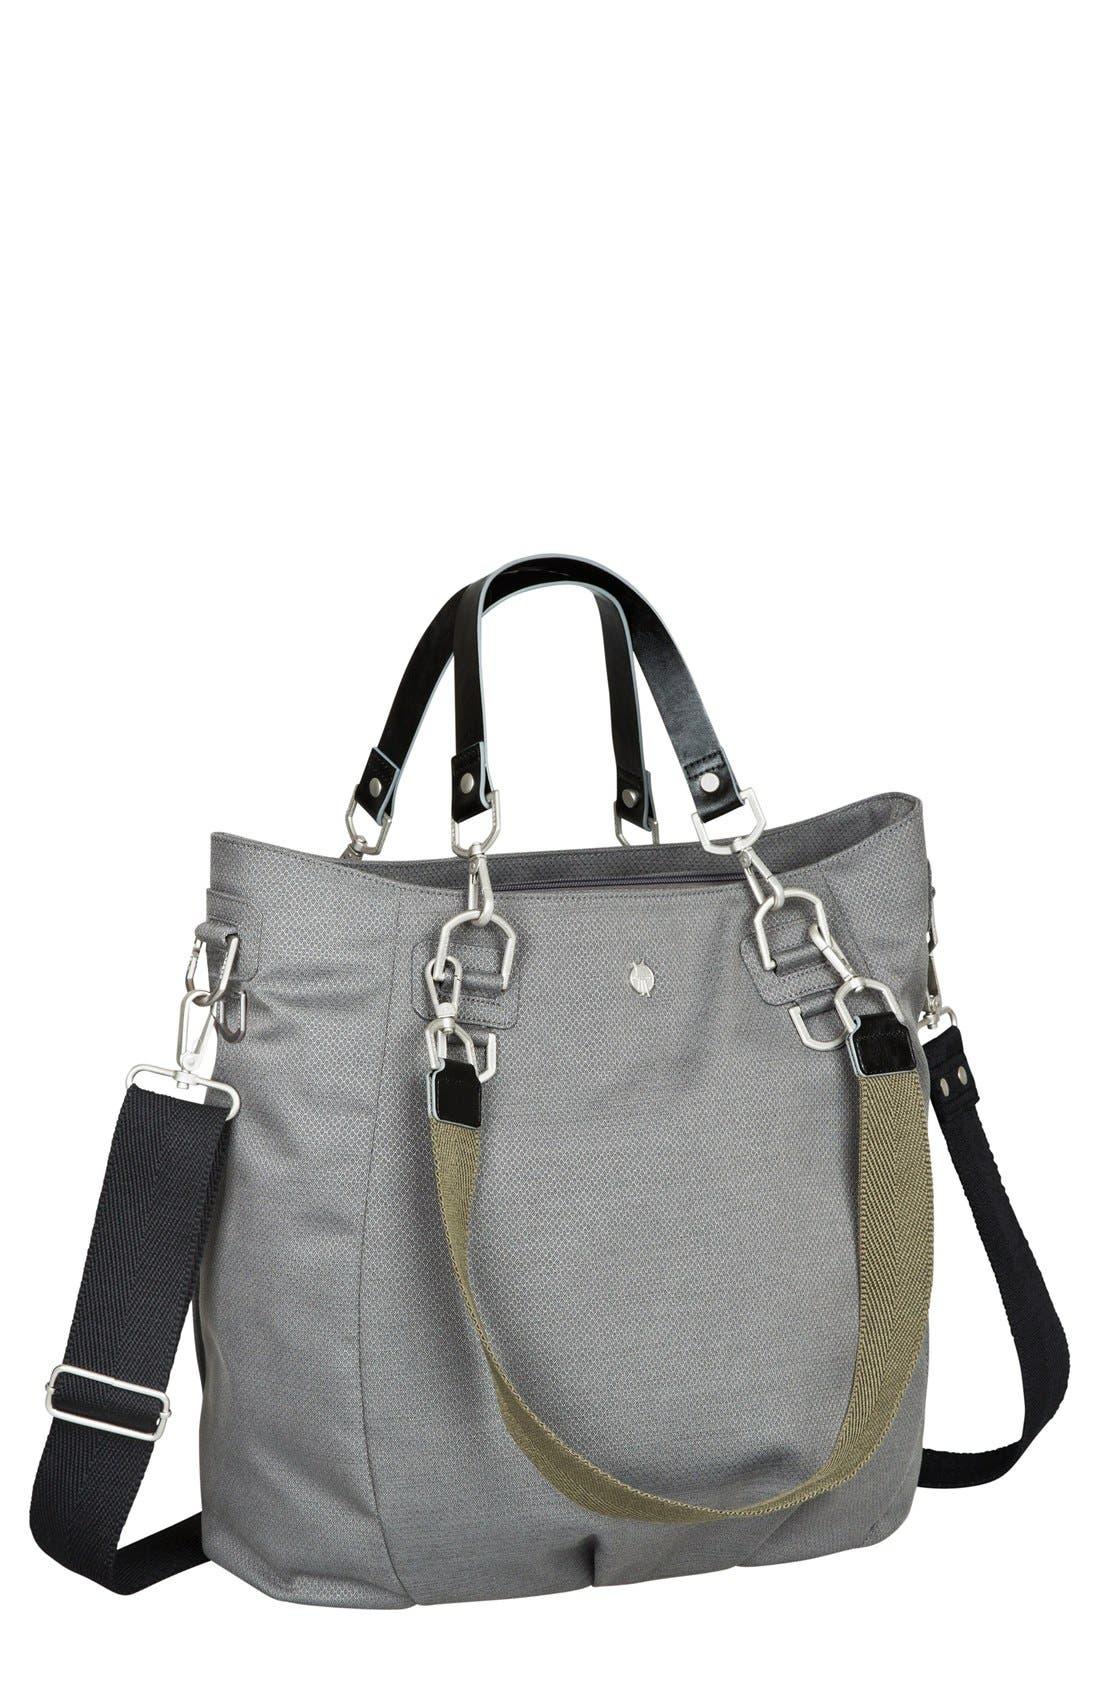 'Green Label - Mix 'N Match' Diaper Bag,                             Main thumbnail 1, color,                             020